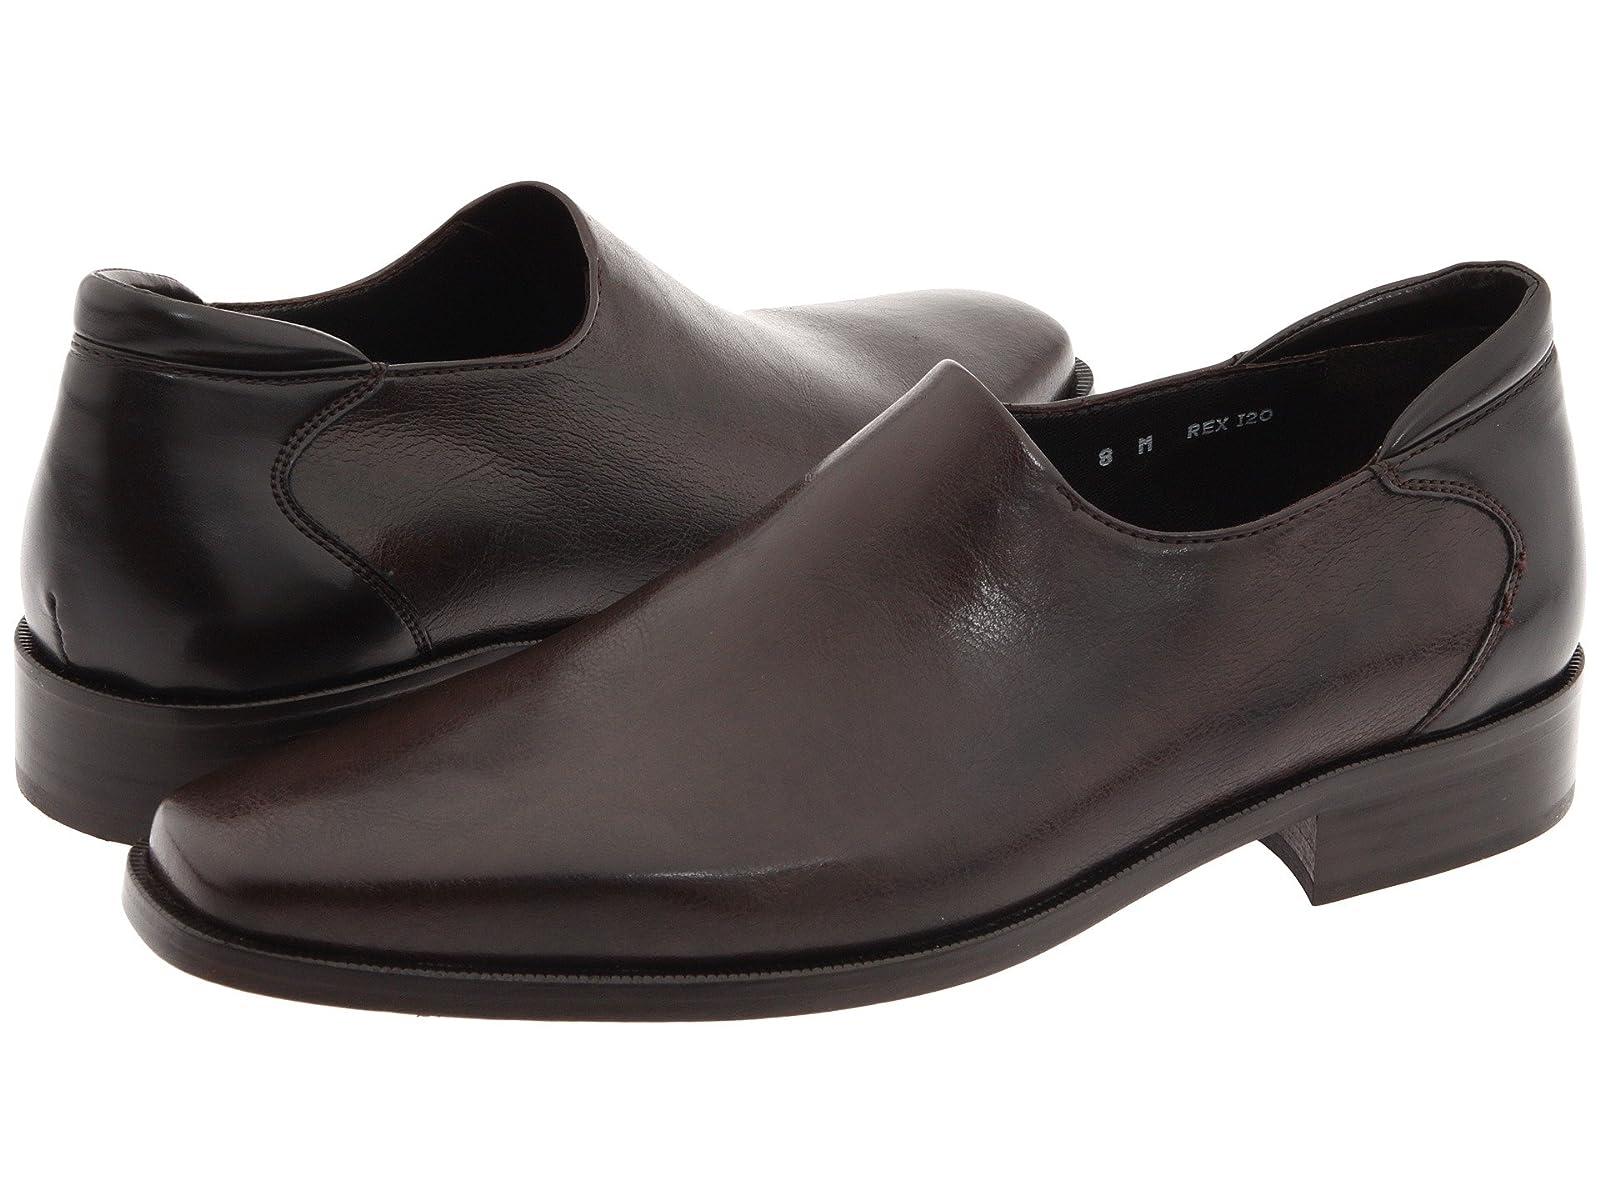 Donald J Pliner RexAtmospheric grades have affordable shoes